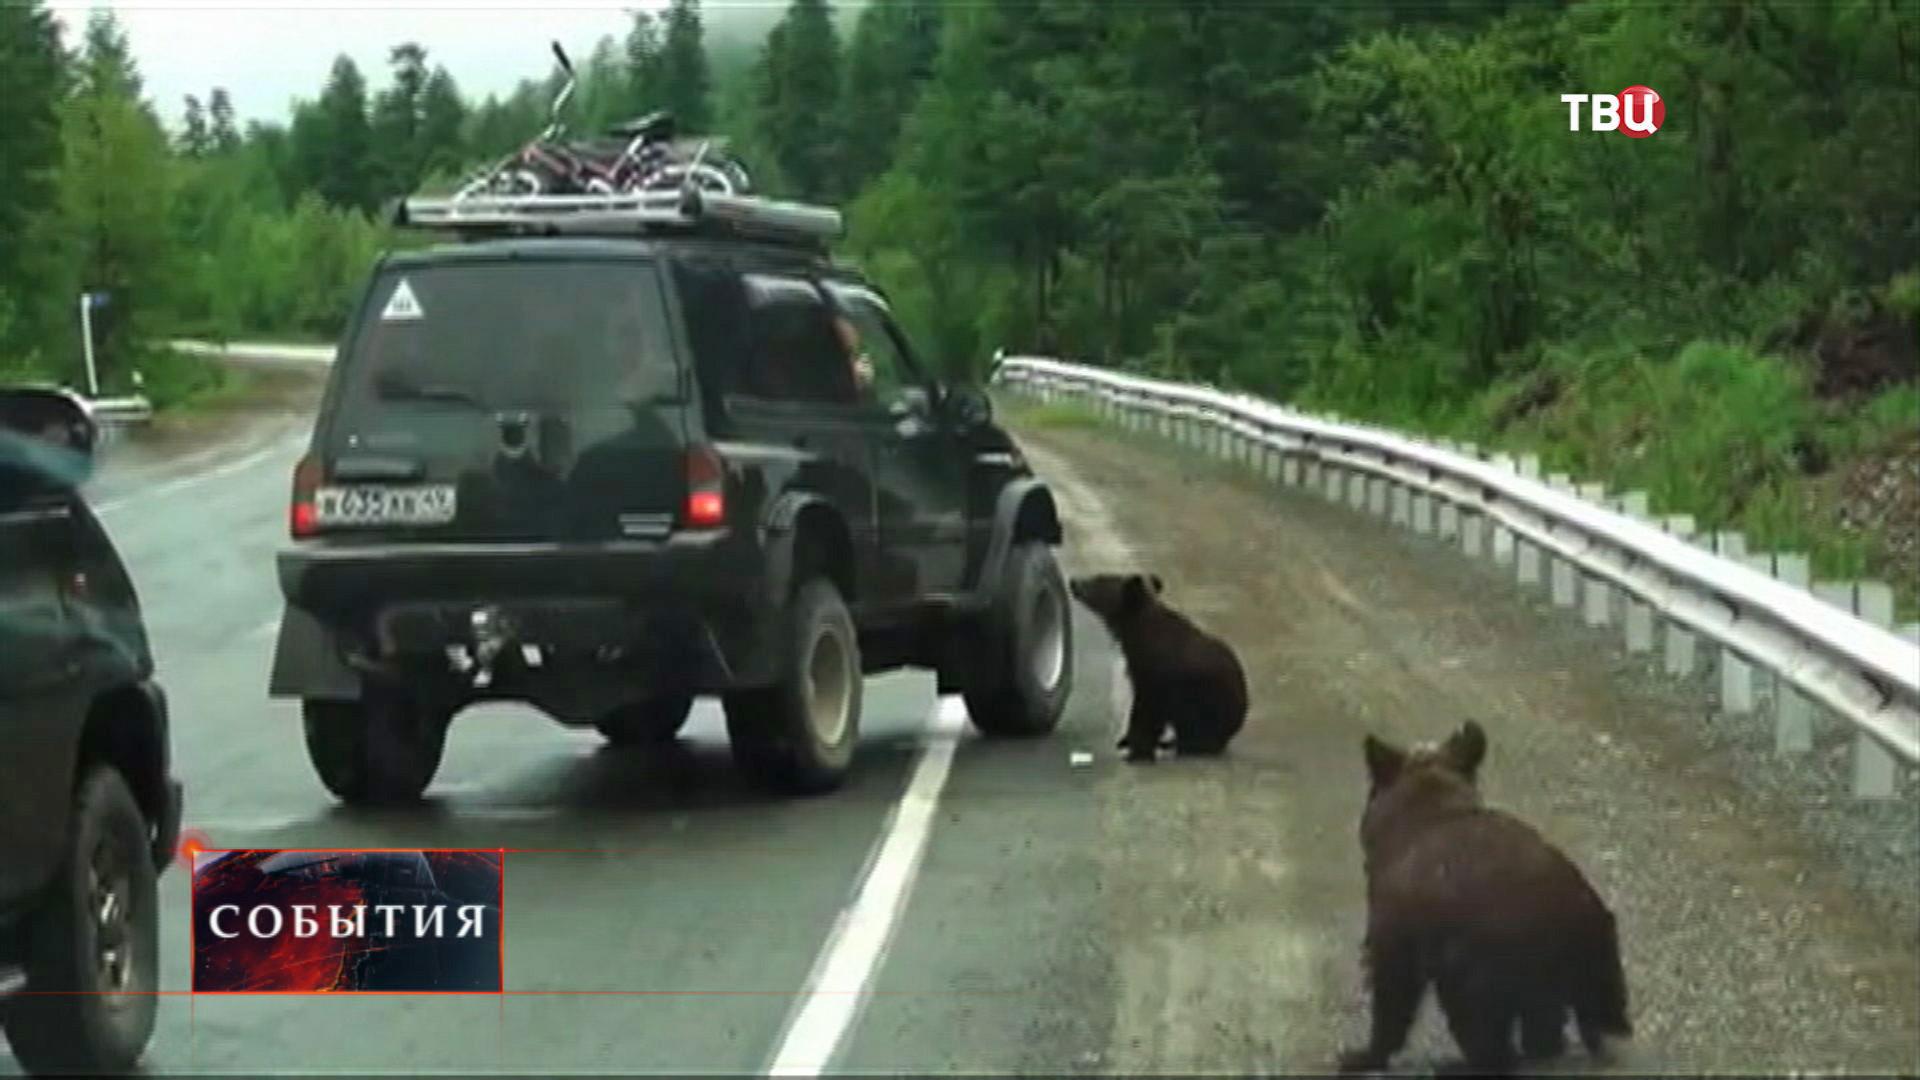 Медведи просят еду у туристов